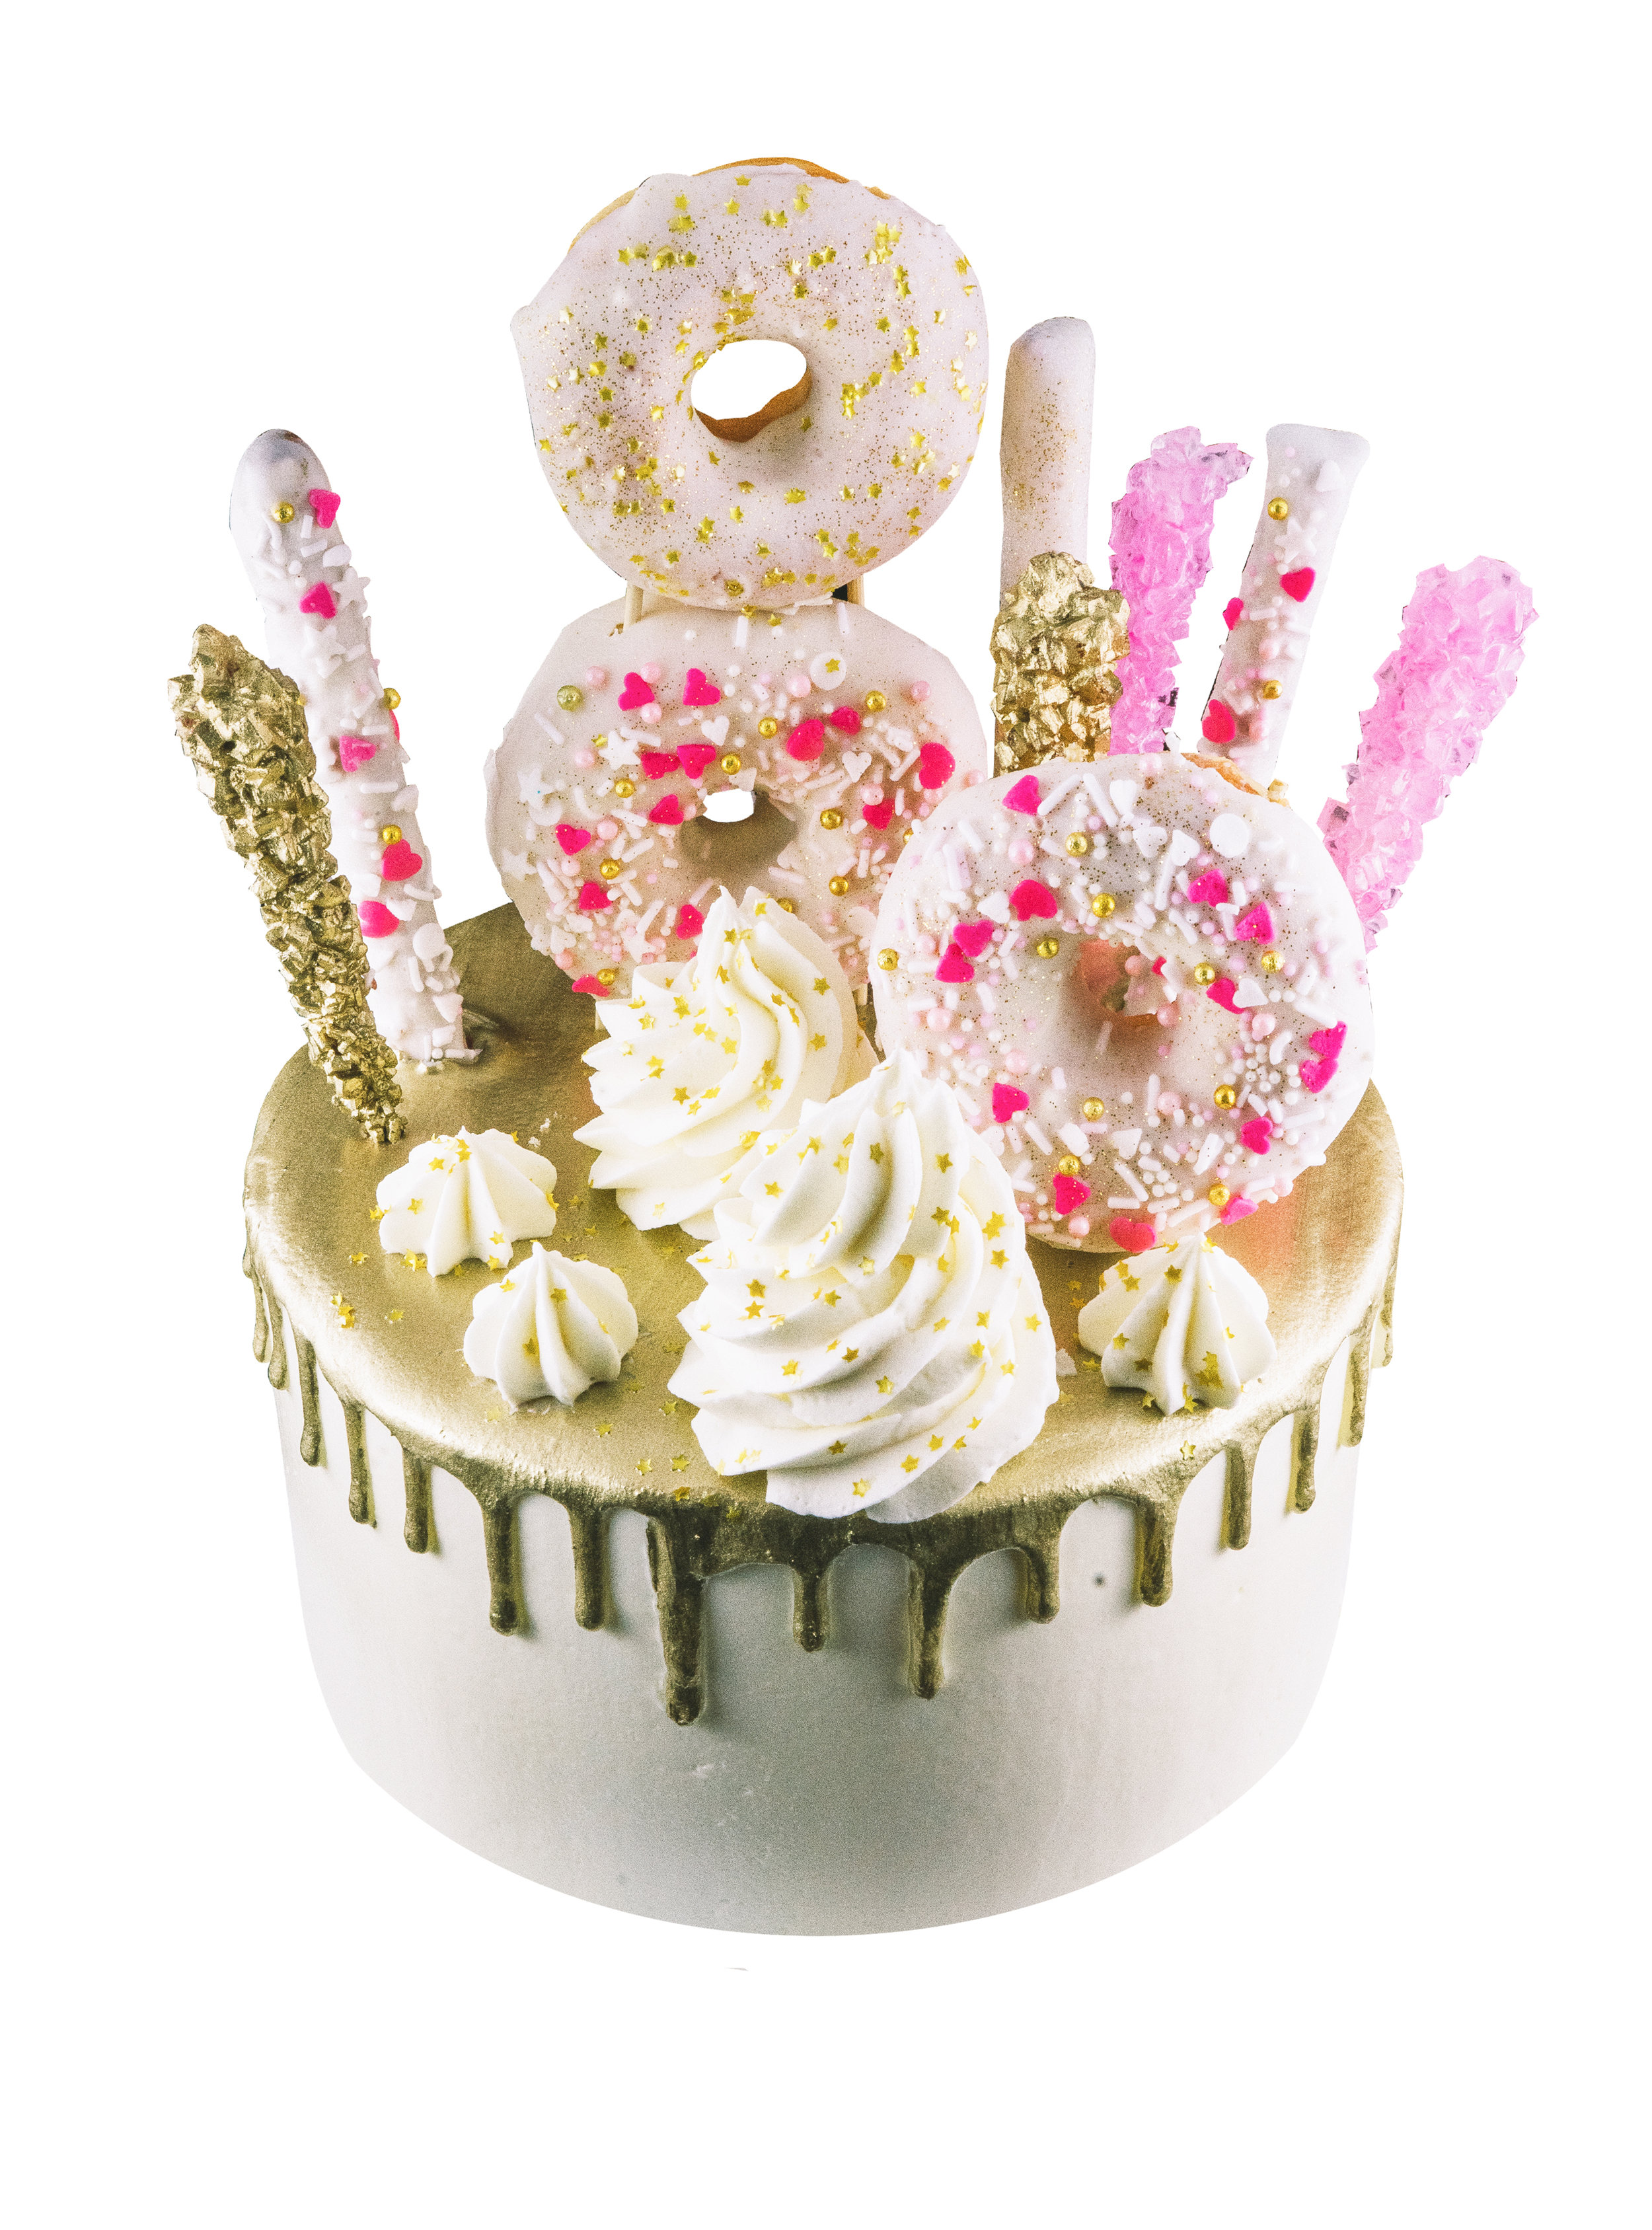 SWEET SIXTEEN CAKE -